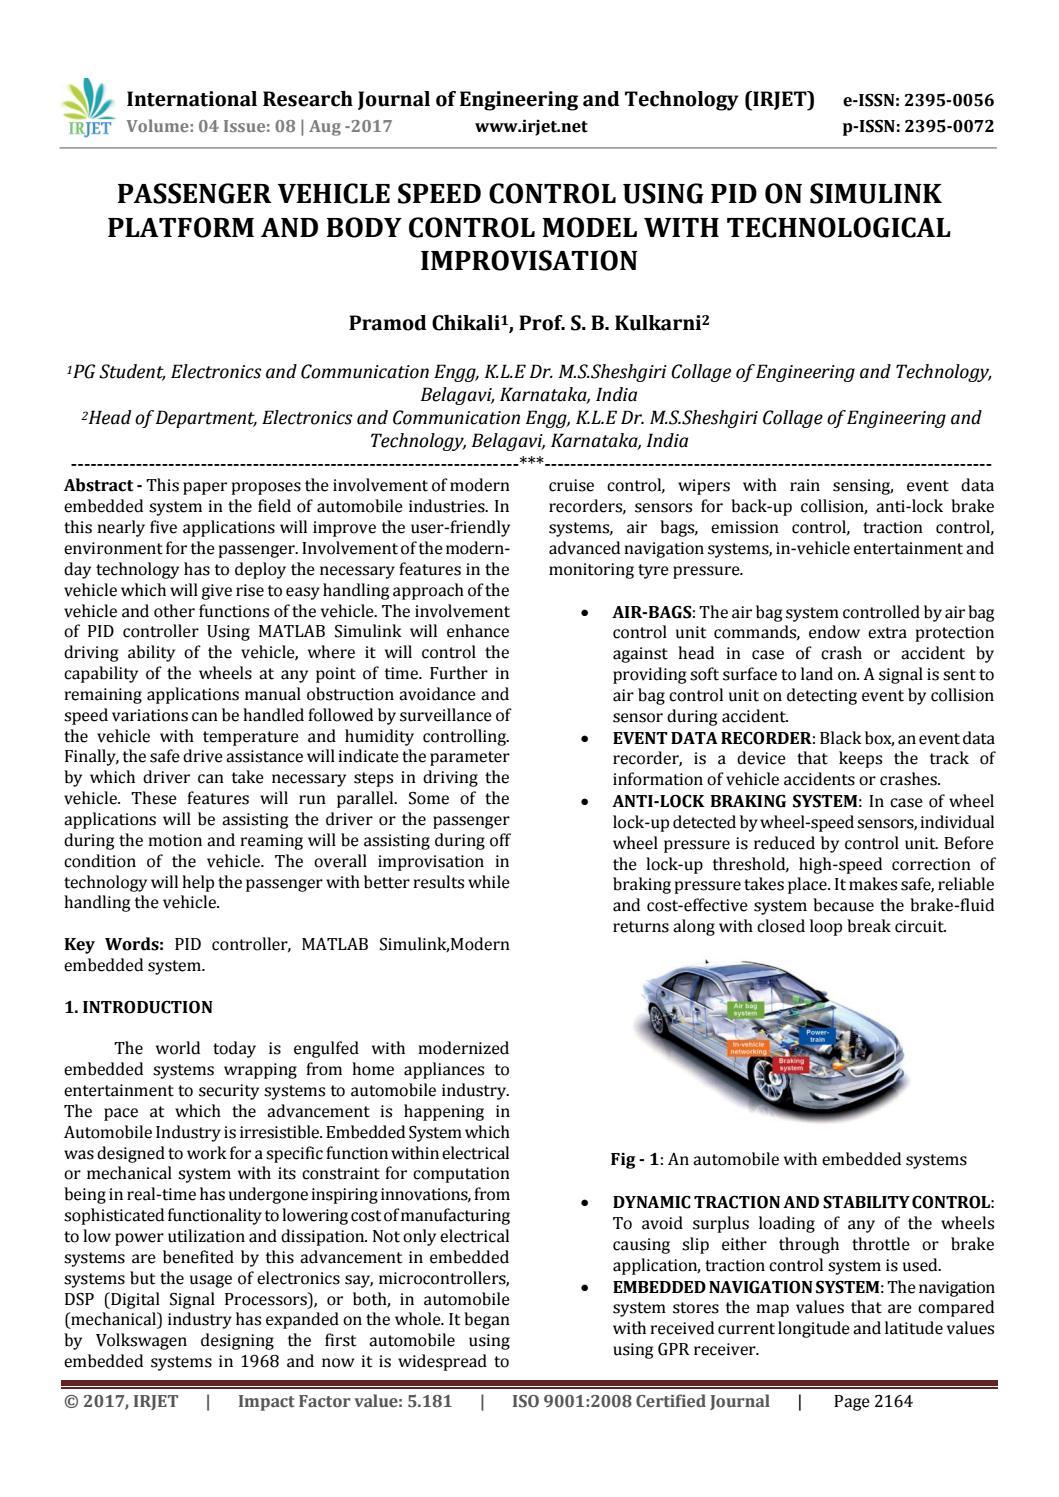 Passenger Vehicle Speed Control using PID on Simulink Platform and